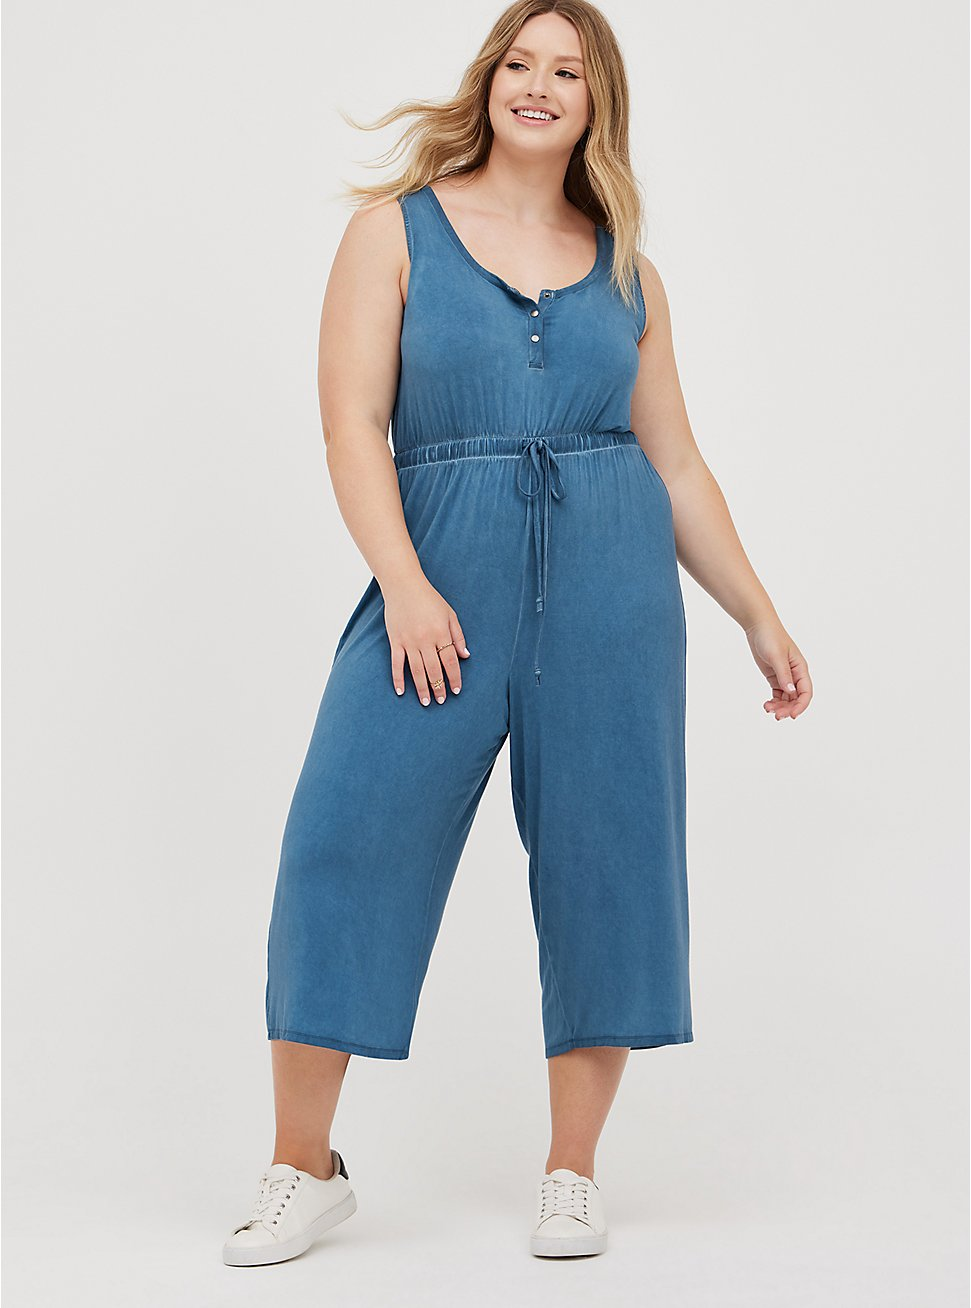 Jumpsuit - Super Soft Mineral Wash Blue, TIE DYE-BLUE, hi-res